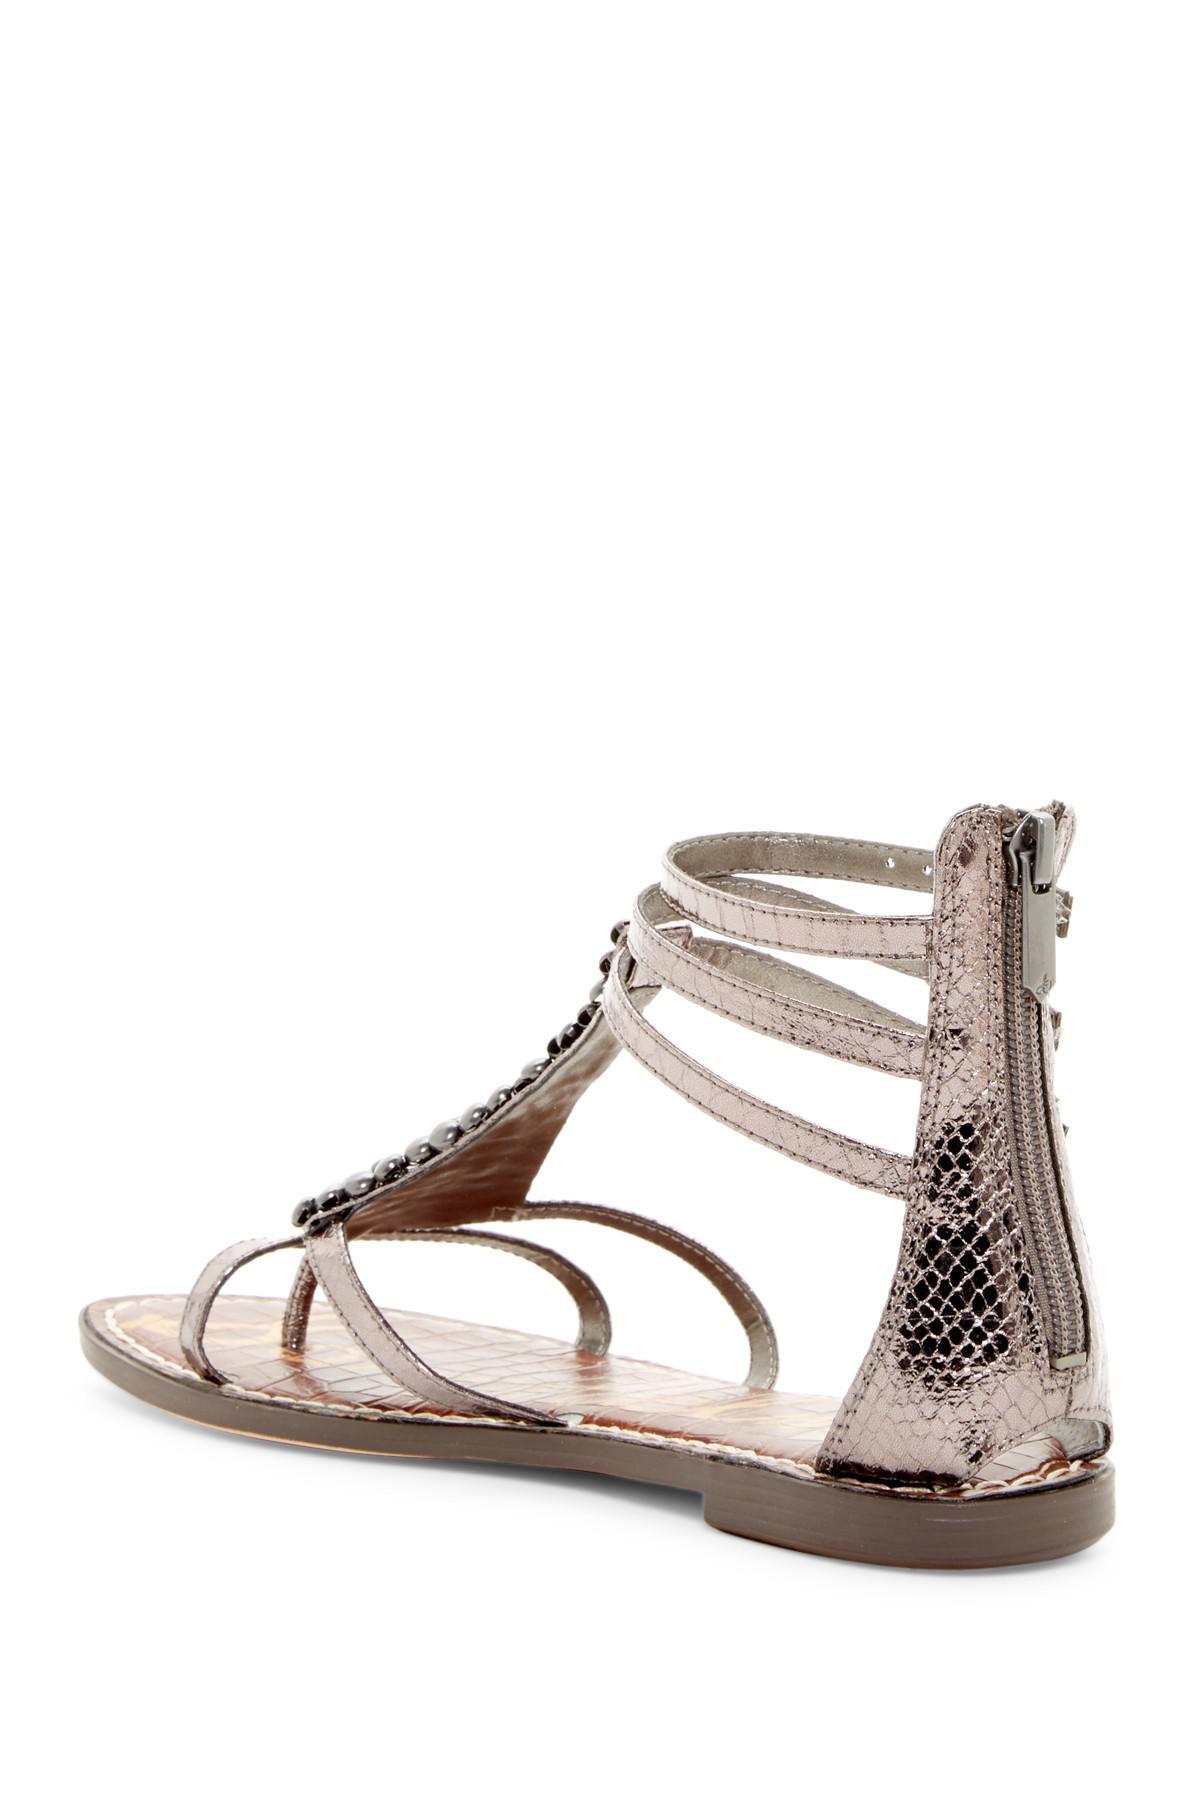 839ba1625ed8 Gallery. Previously sold at  Nordstrom Rack · Women s Gladiator Sandals  Women s Sam Edelman ...